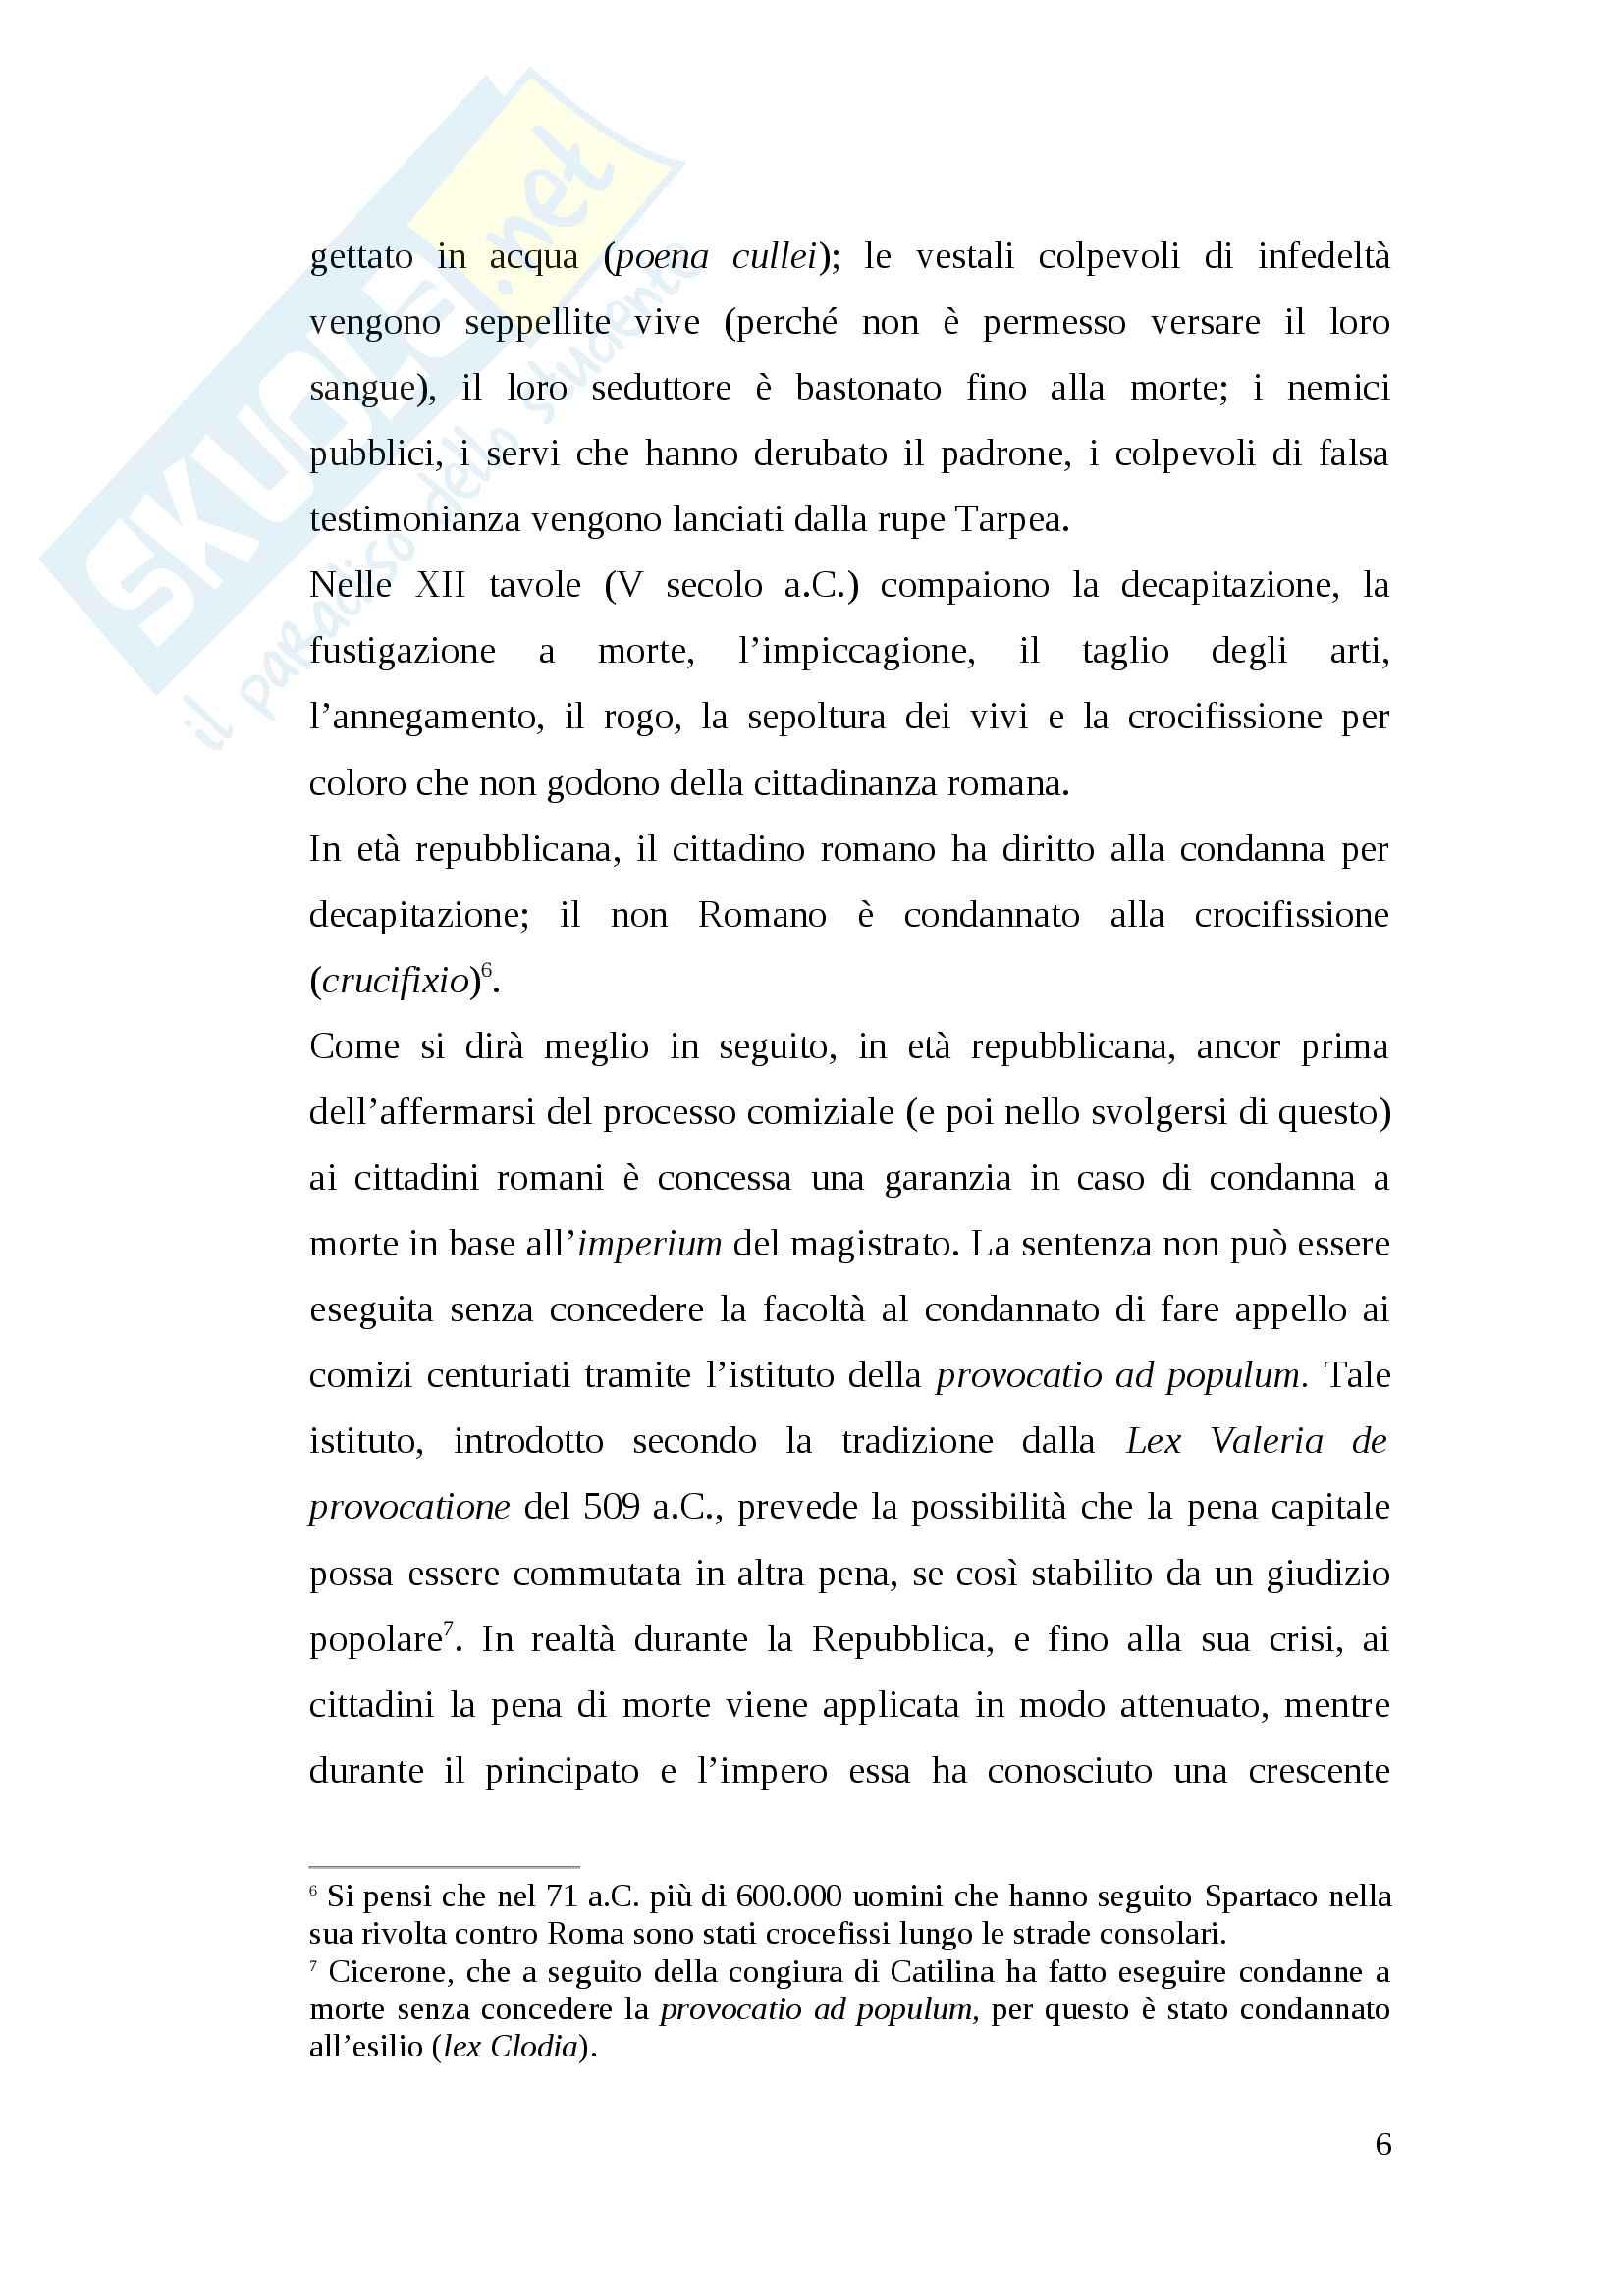 Tesi pena di morte antica Roma Pag. 6